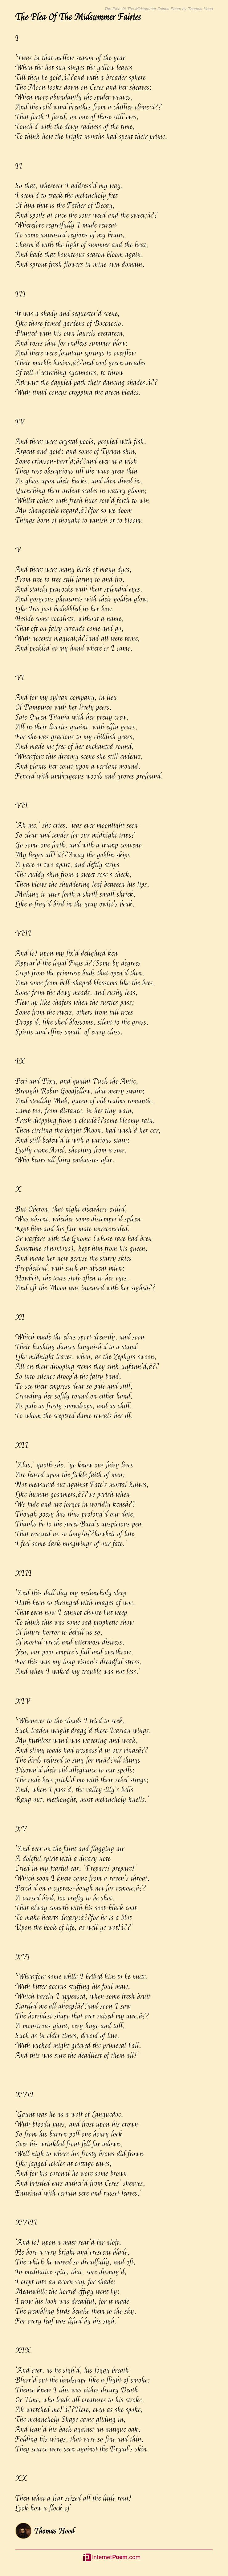 The Plea Of The Midsummer Fairies Poem By Thomas Hood